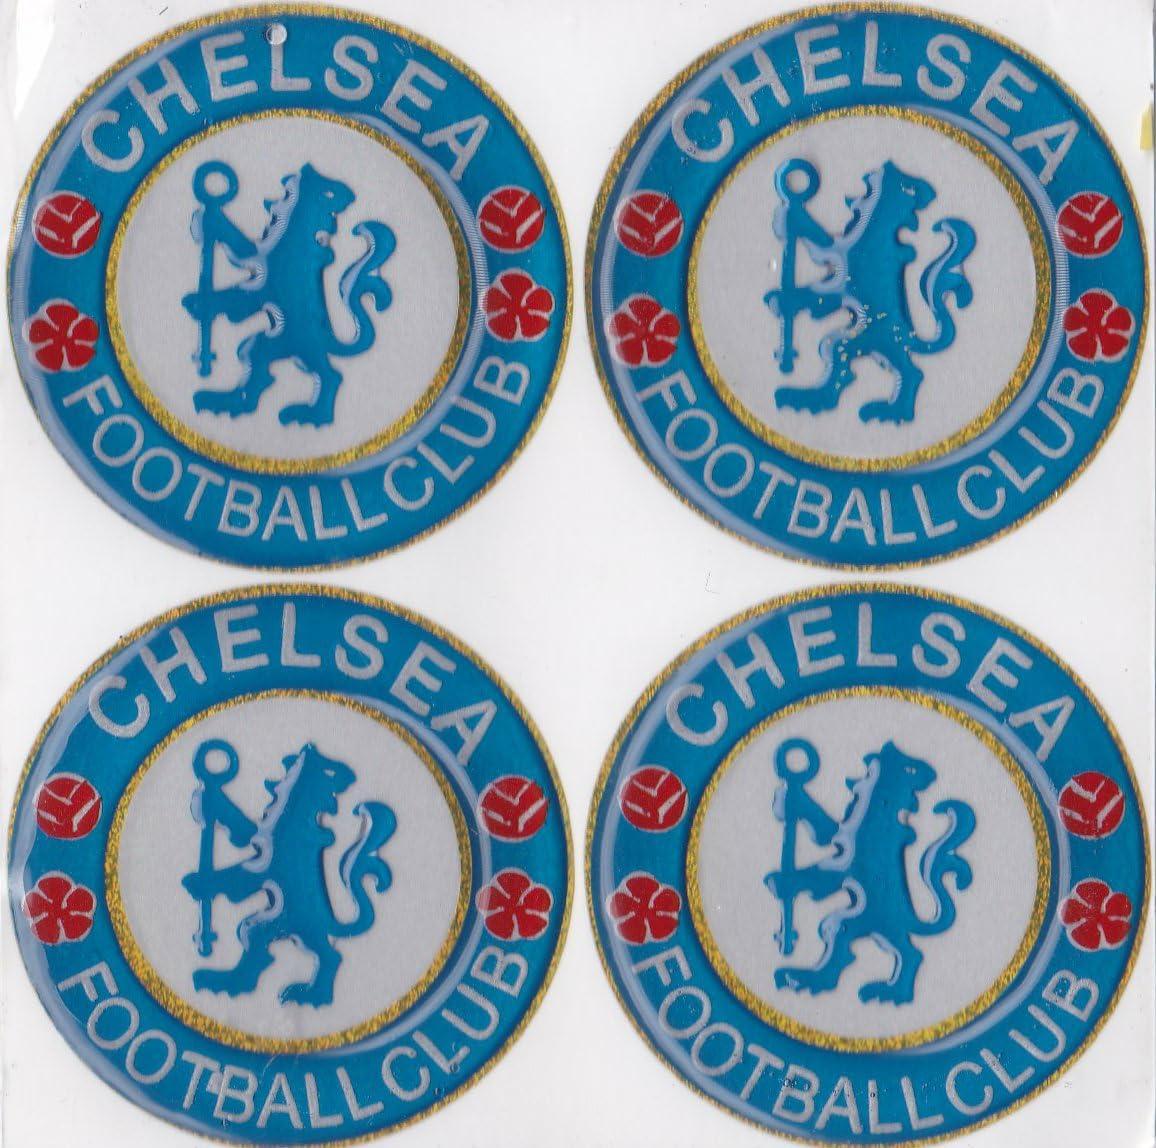 Amazon Com Emboss Sticker G401 4x Chelsea Fc Football Club Soccer Team Sports Car Bumper Luggage Window Wall Skate Decal 2 5cm Home Kitchen [ 1148 x 1156 Pixel ]